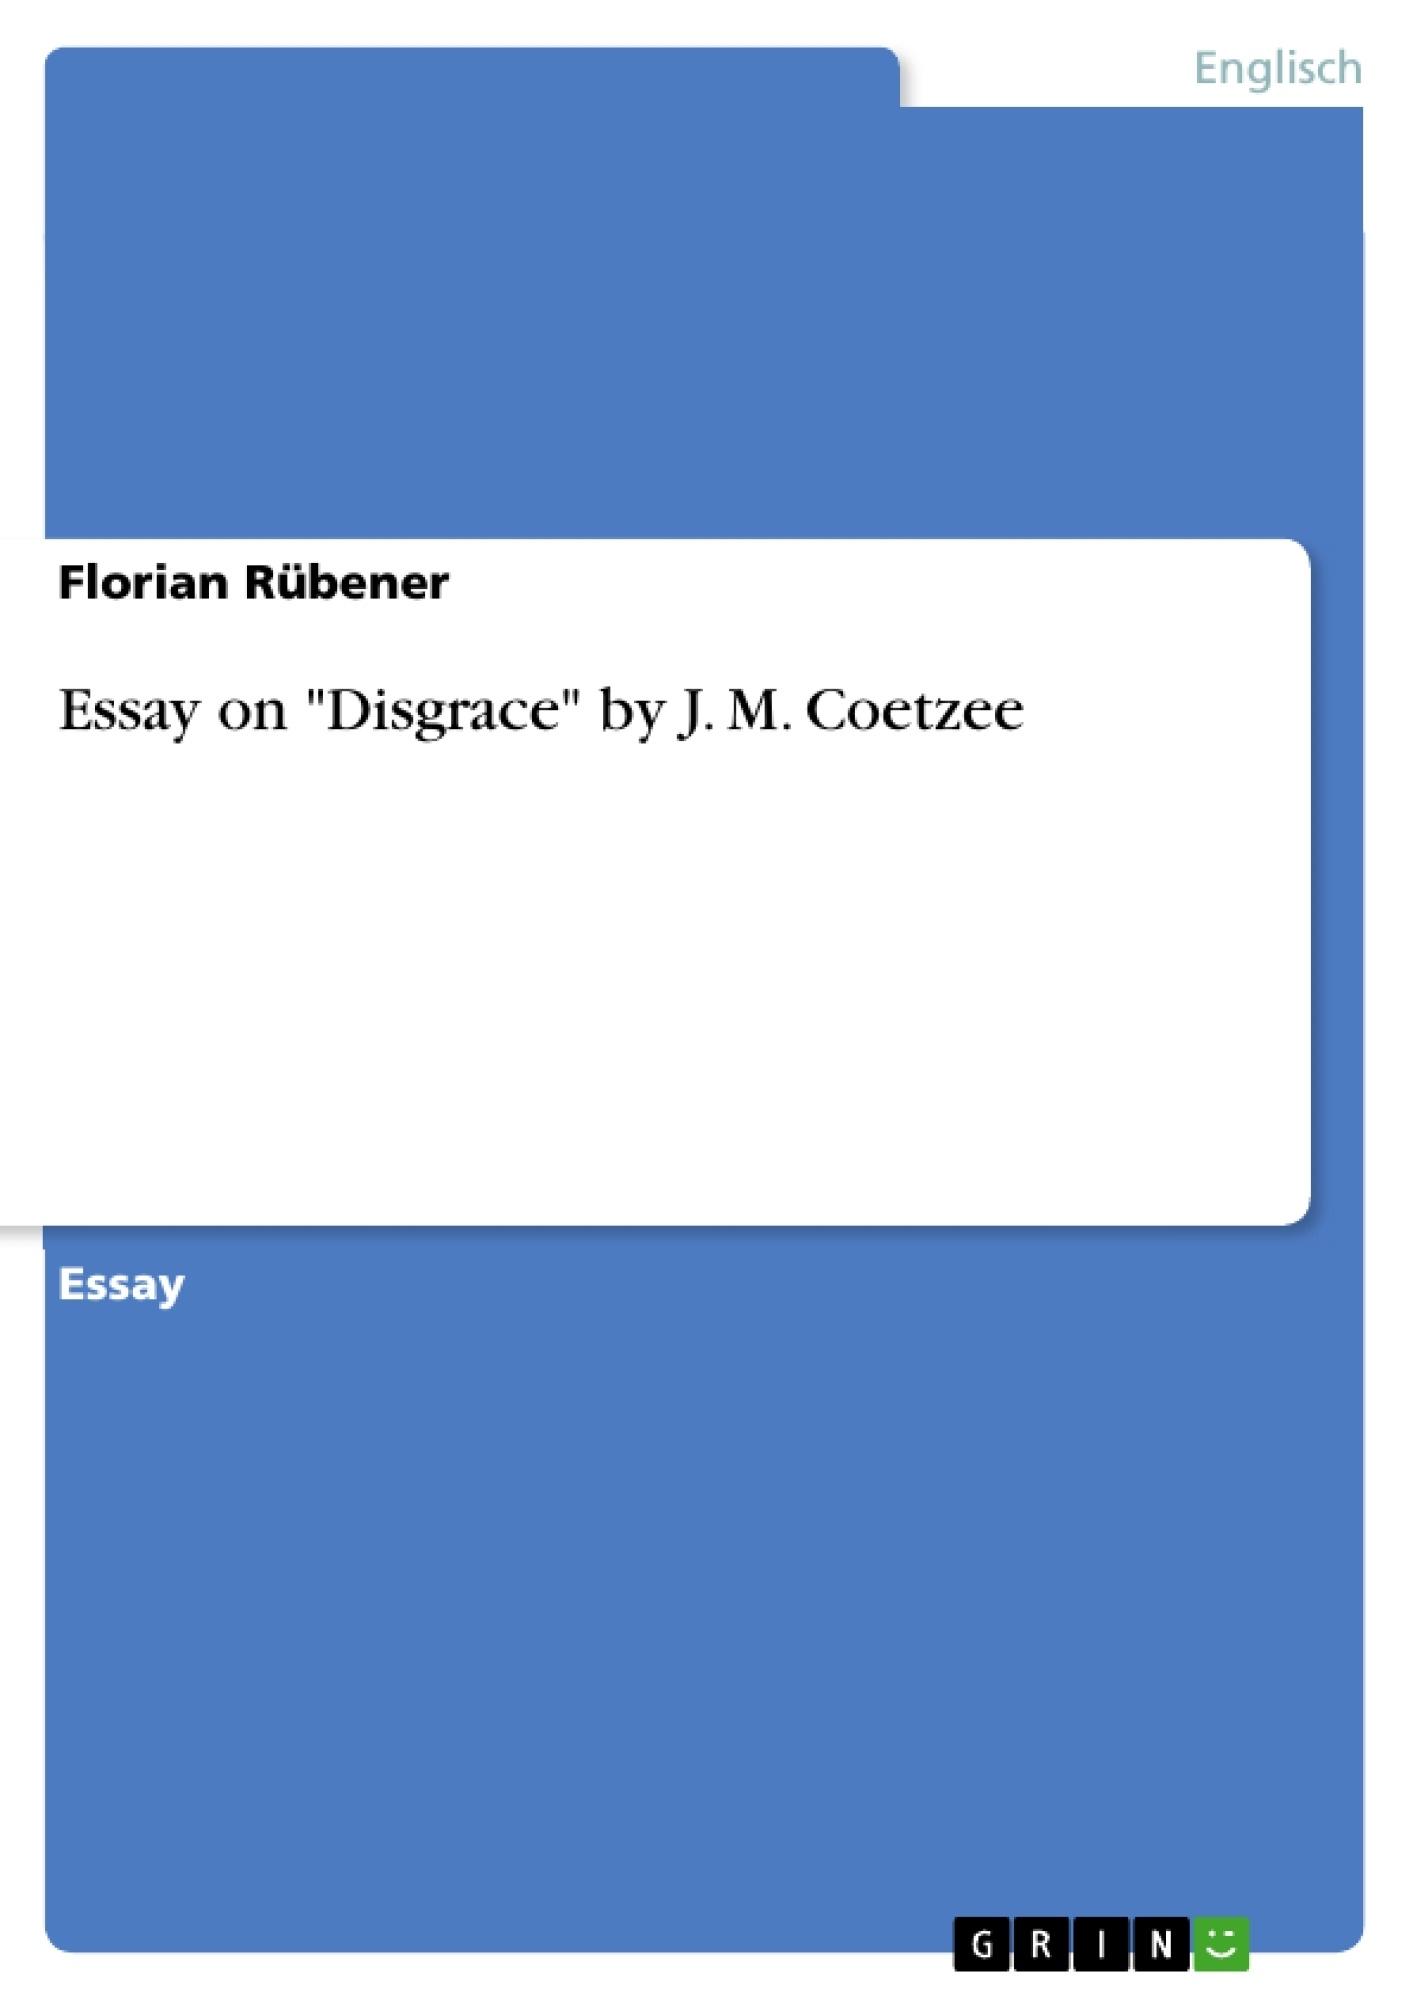 jm coetzee disgrace essay